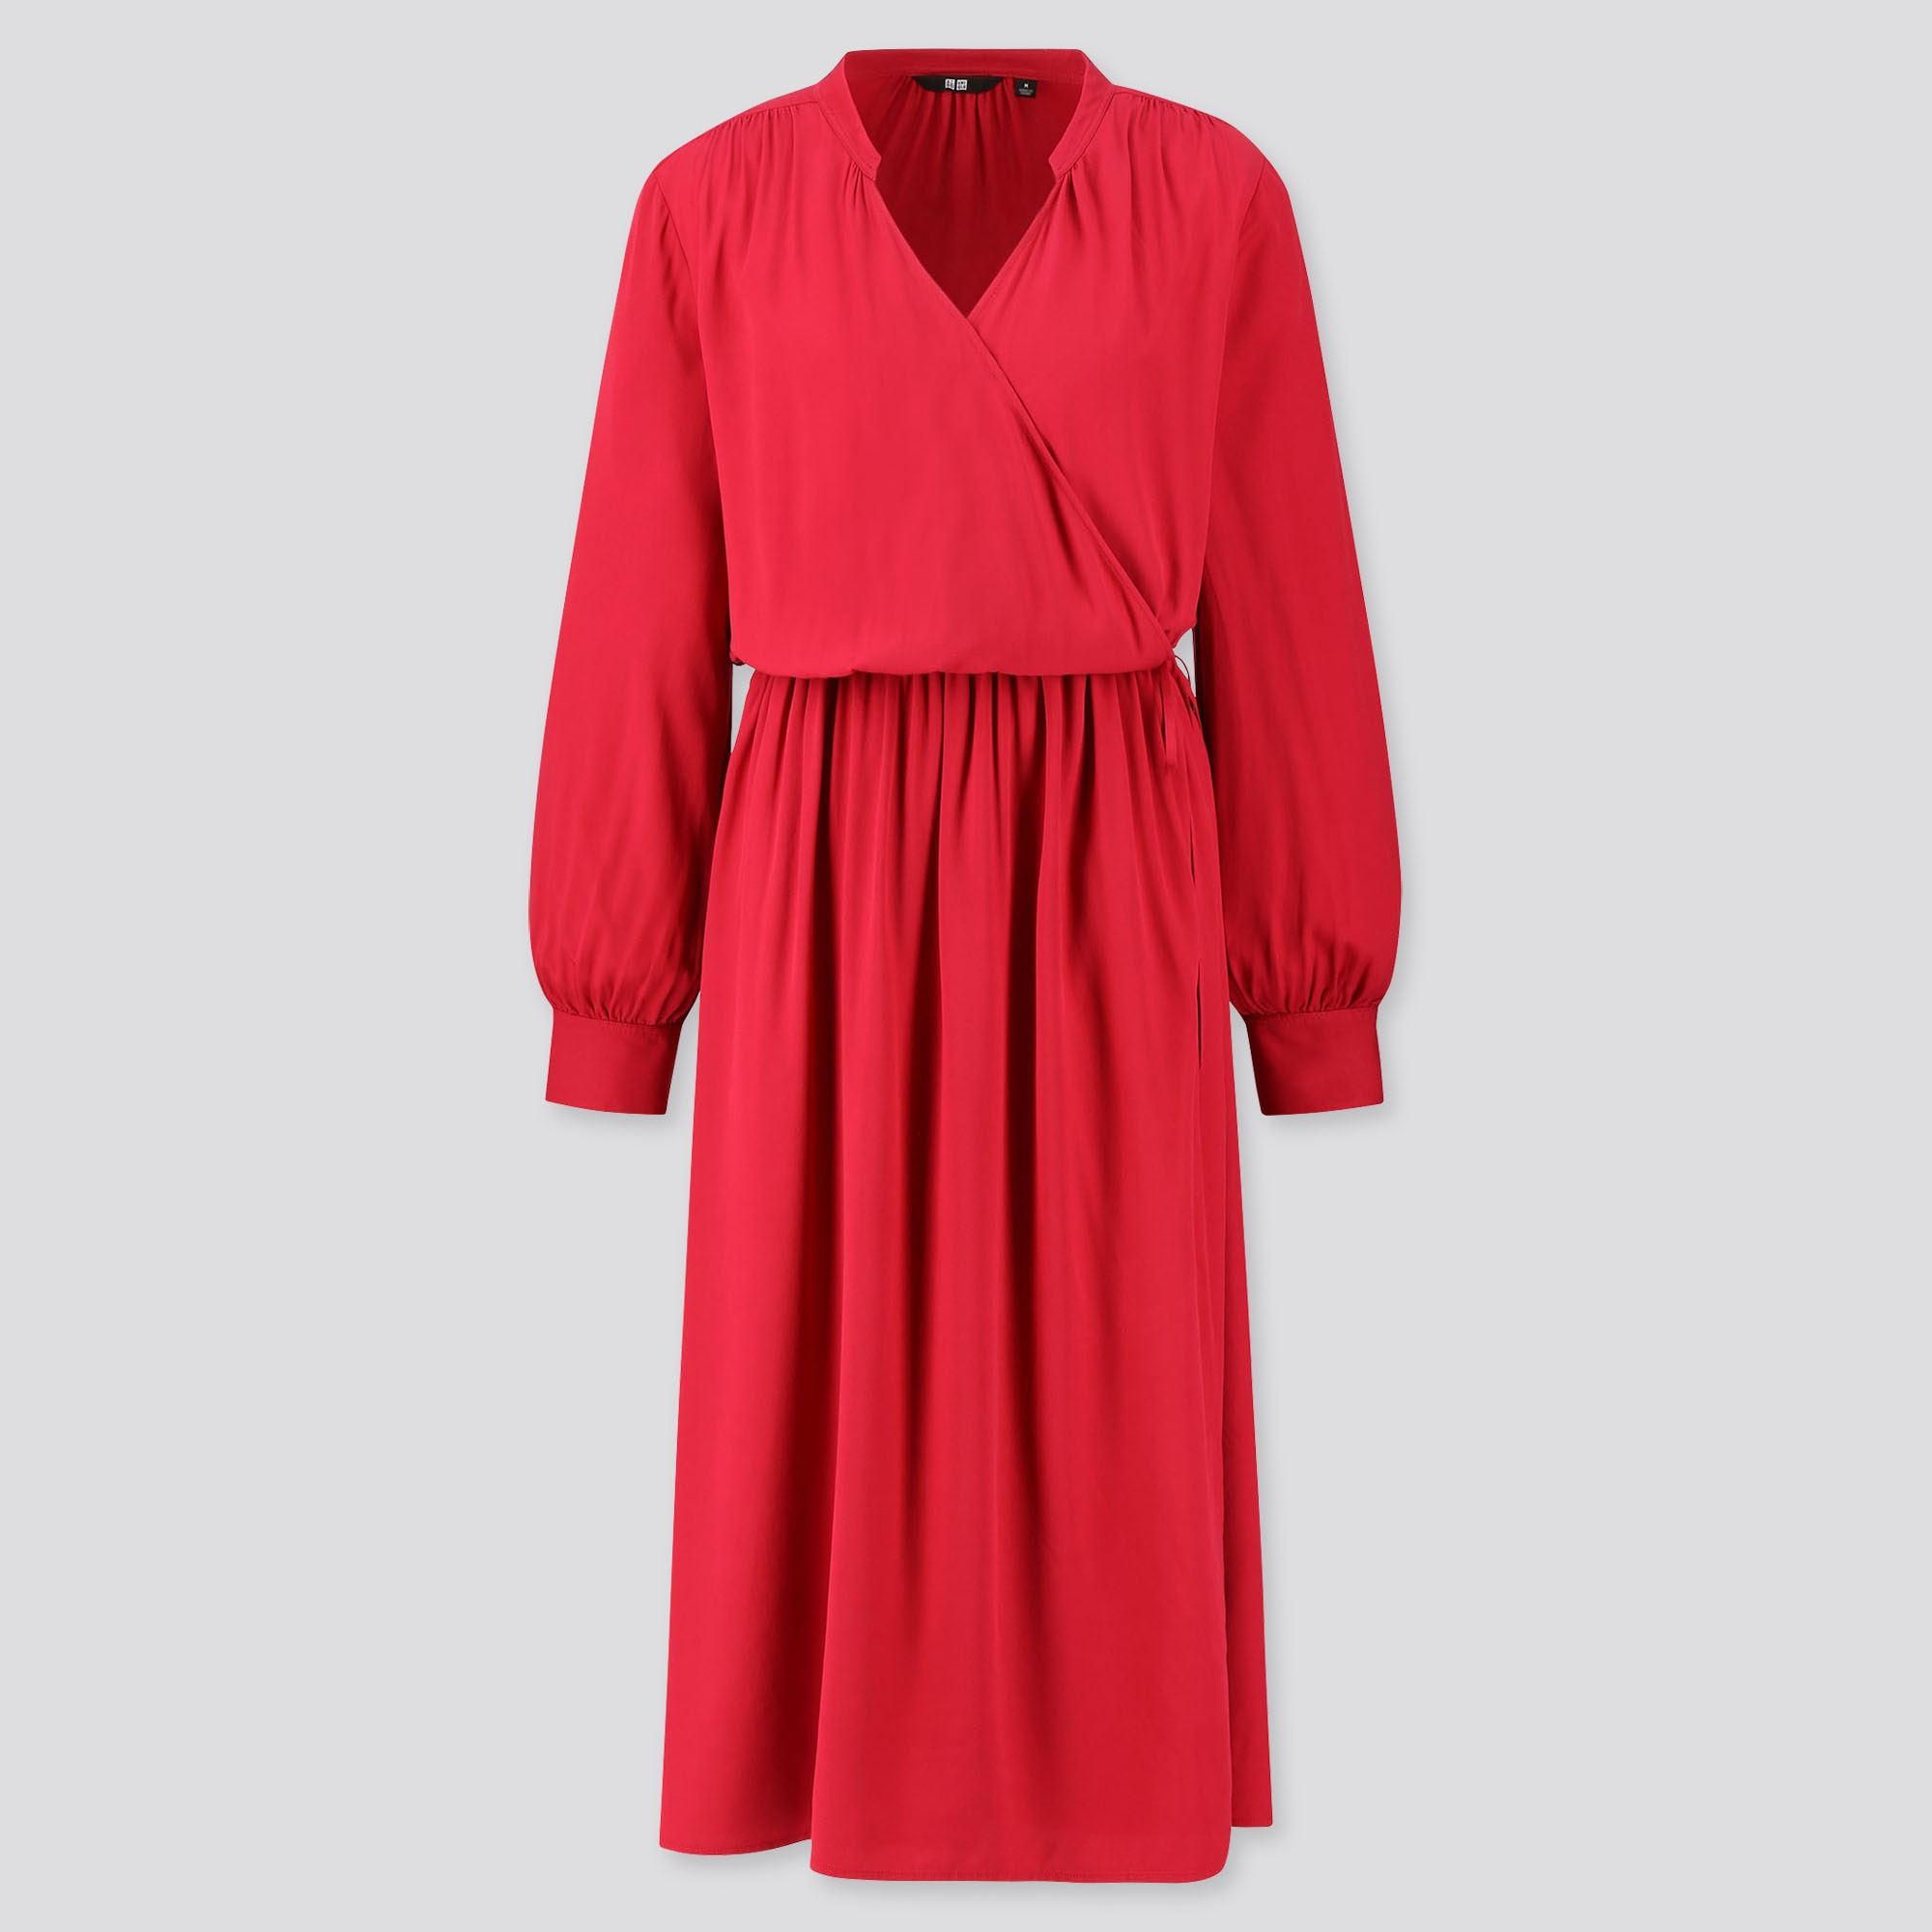 Women Rayon Long Sleeved Wrap Dress